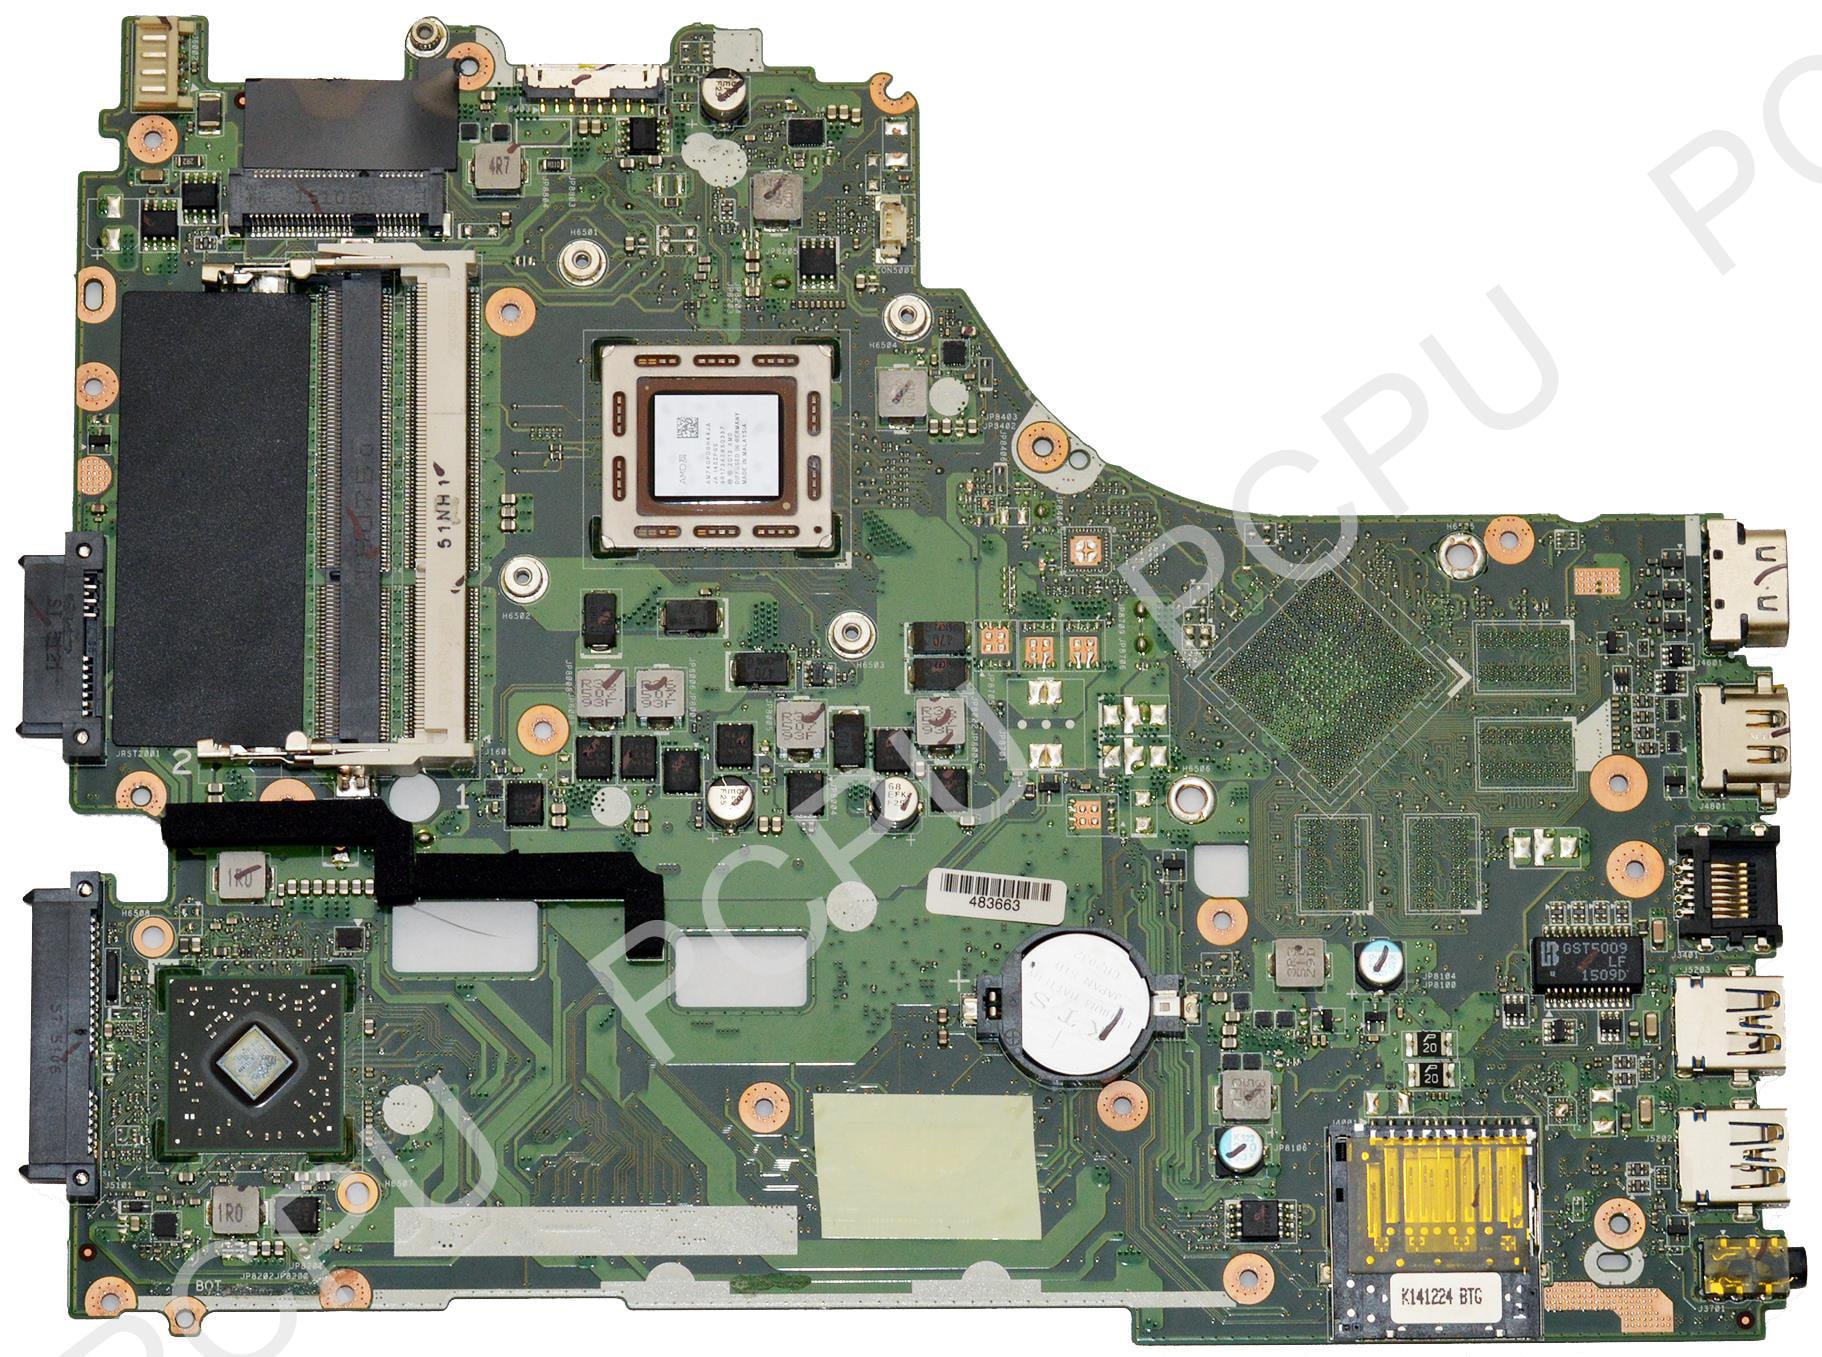 60NB07A0 MB1400 Asus X550ZA Laptop Motherboard w AMD A10 7400P 2 5Ghz CPU Walmart